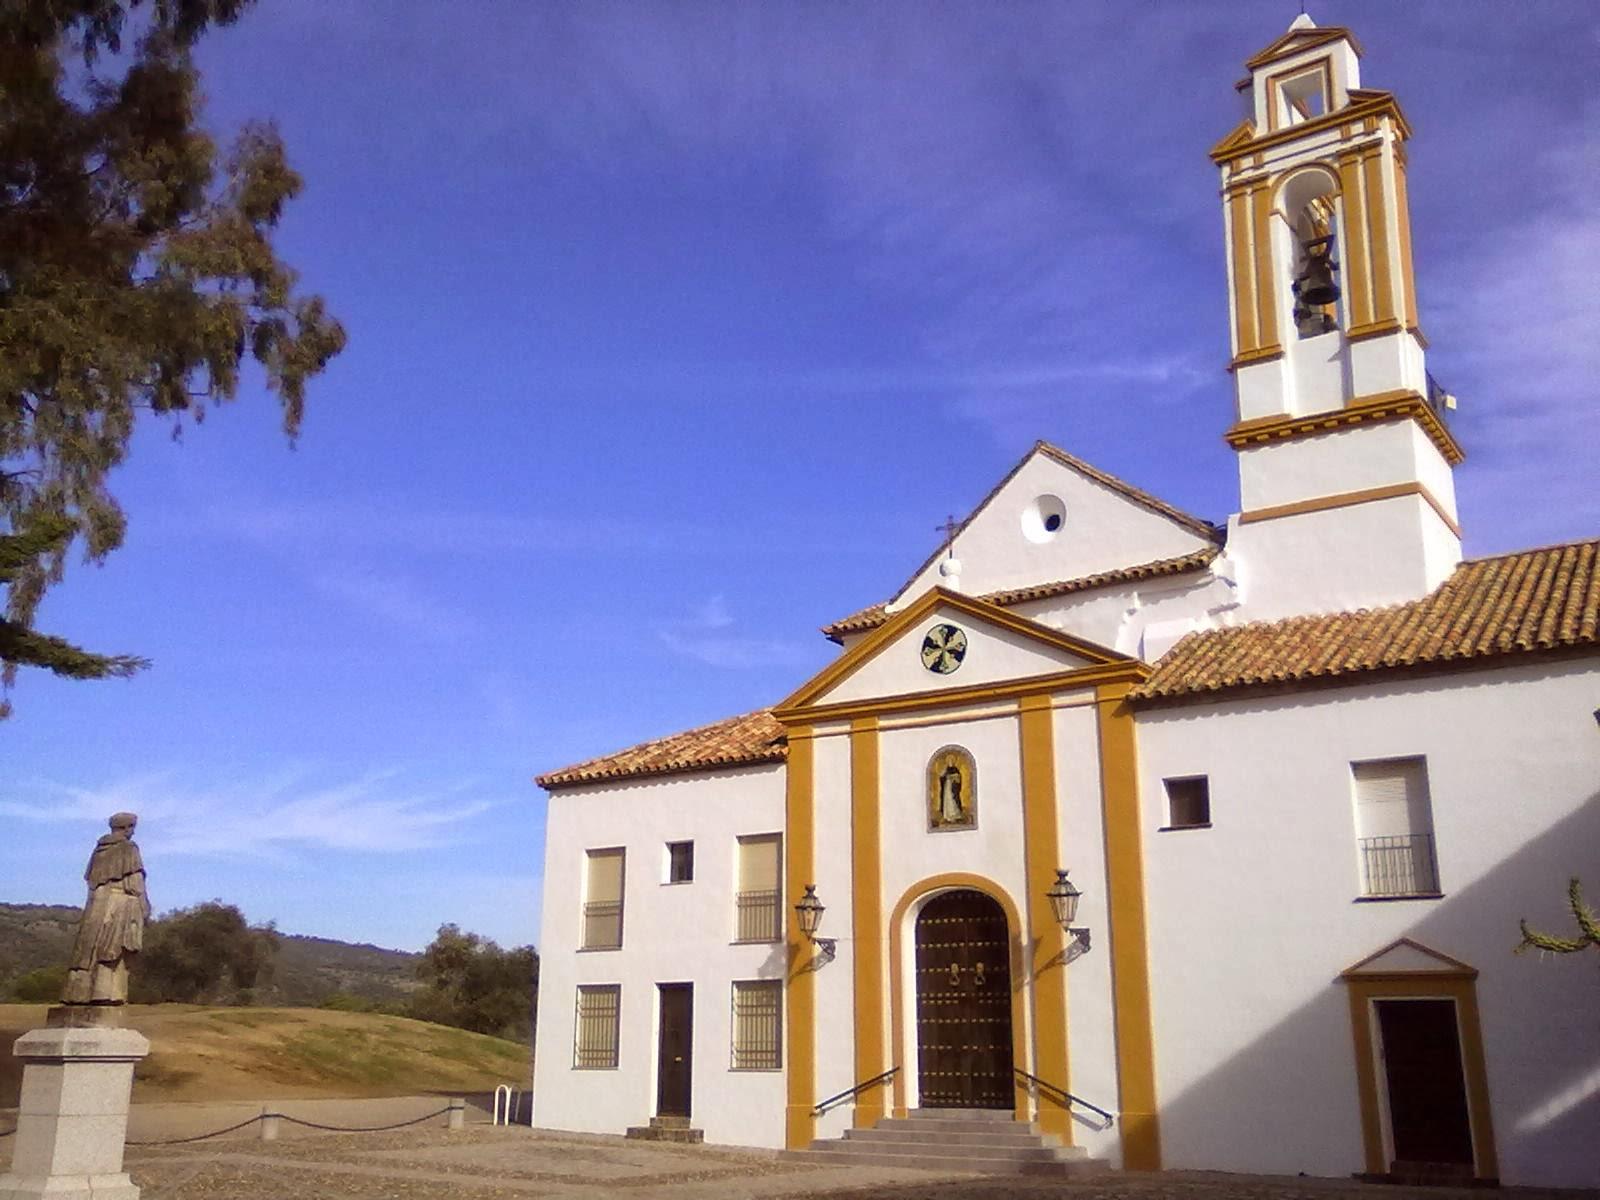 Arroyo Pedroche - Santo Domingo - PR-A 332 Circular Trail